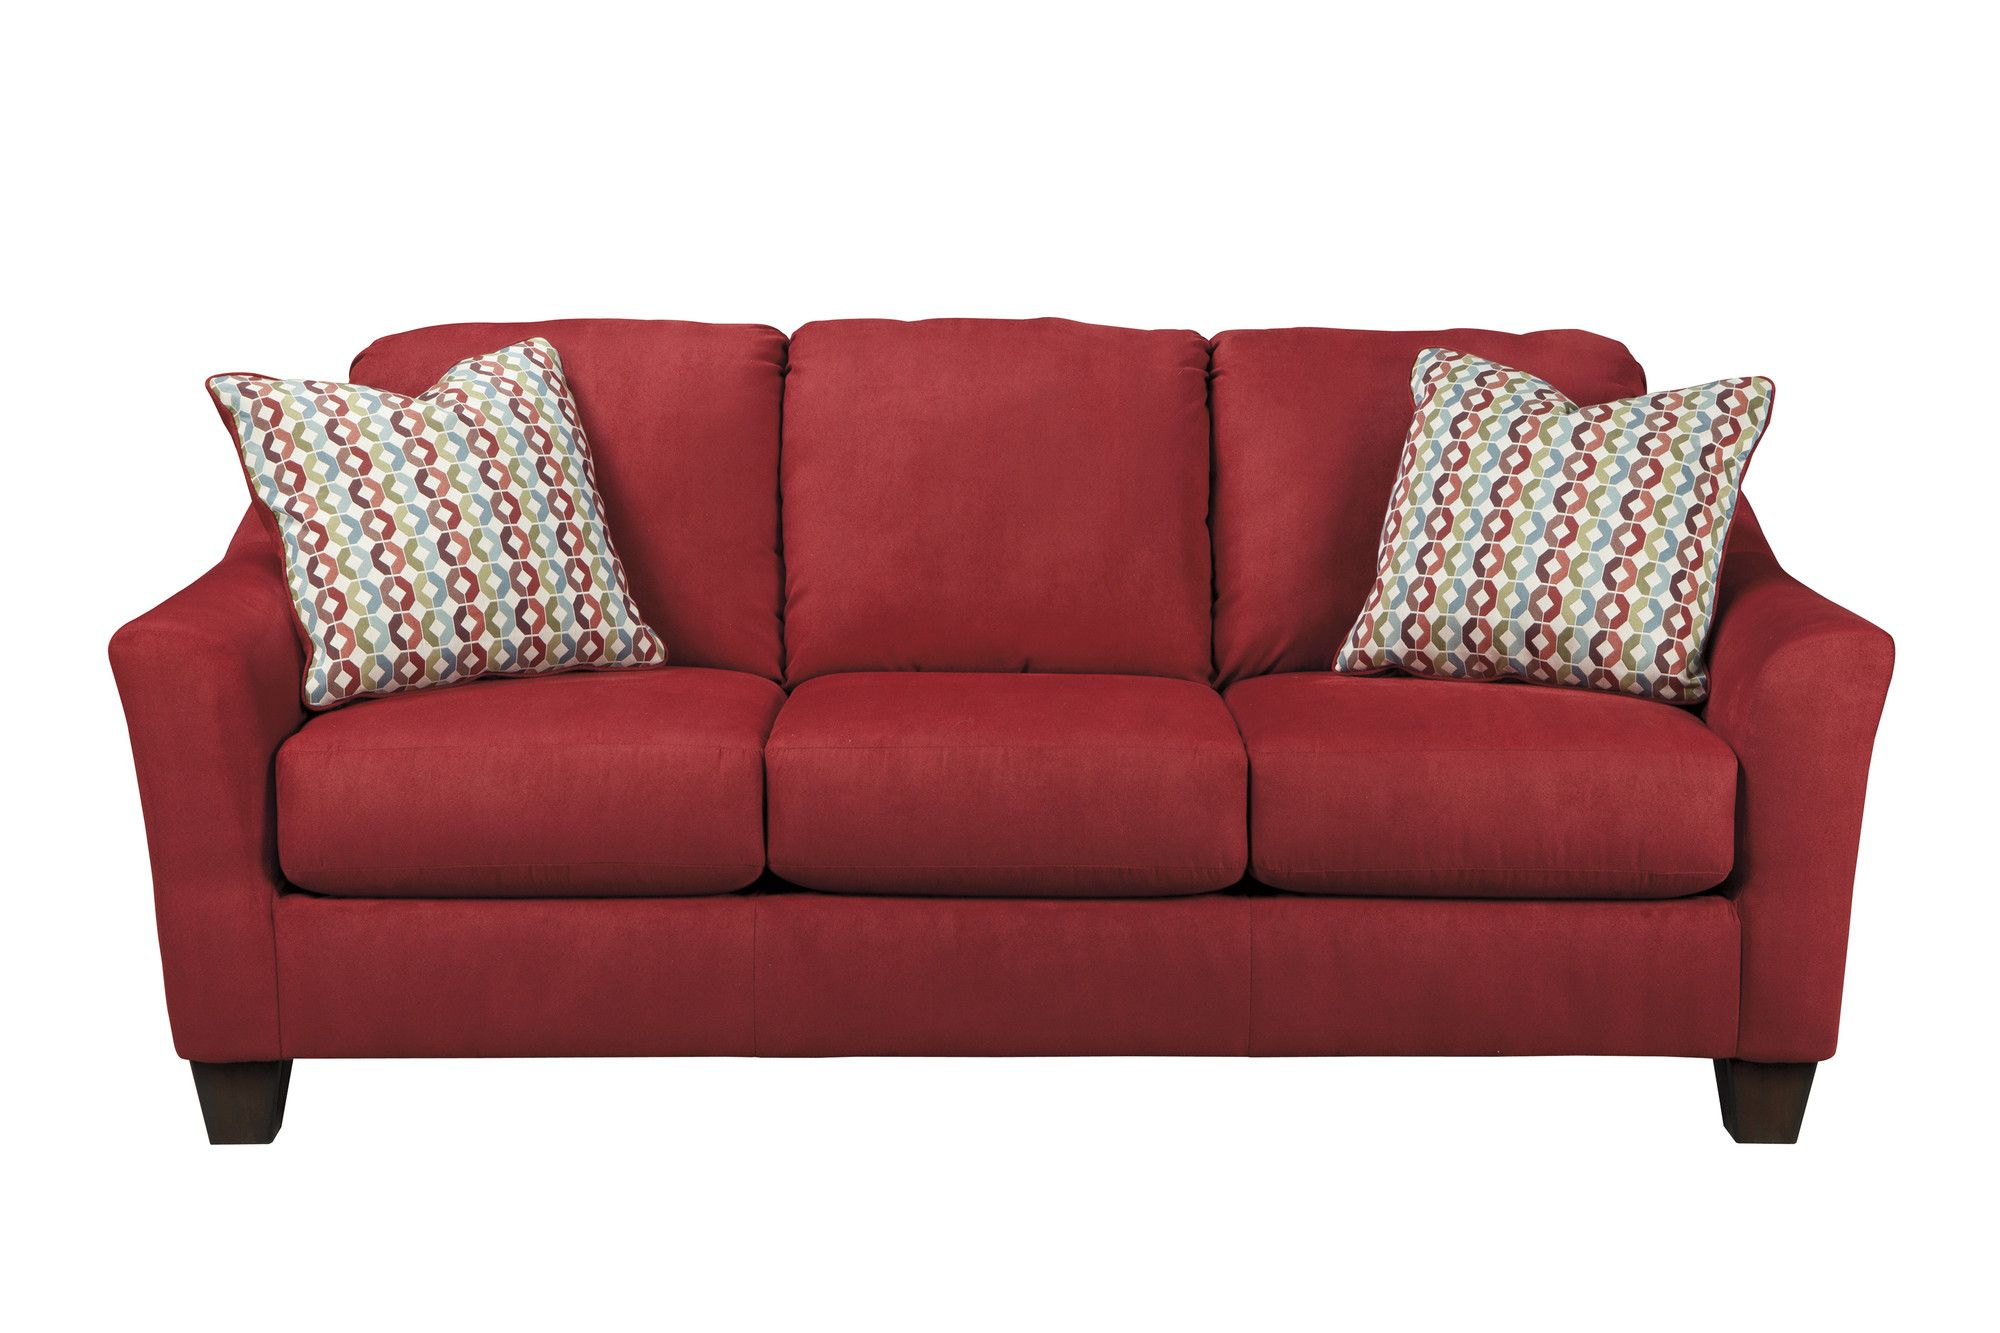 Magnificent Youll Love The Miranda 82 Sleeper Sofa At Joss Main Home Interior And Landscaping Ologienasavecom